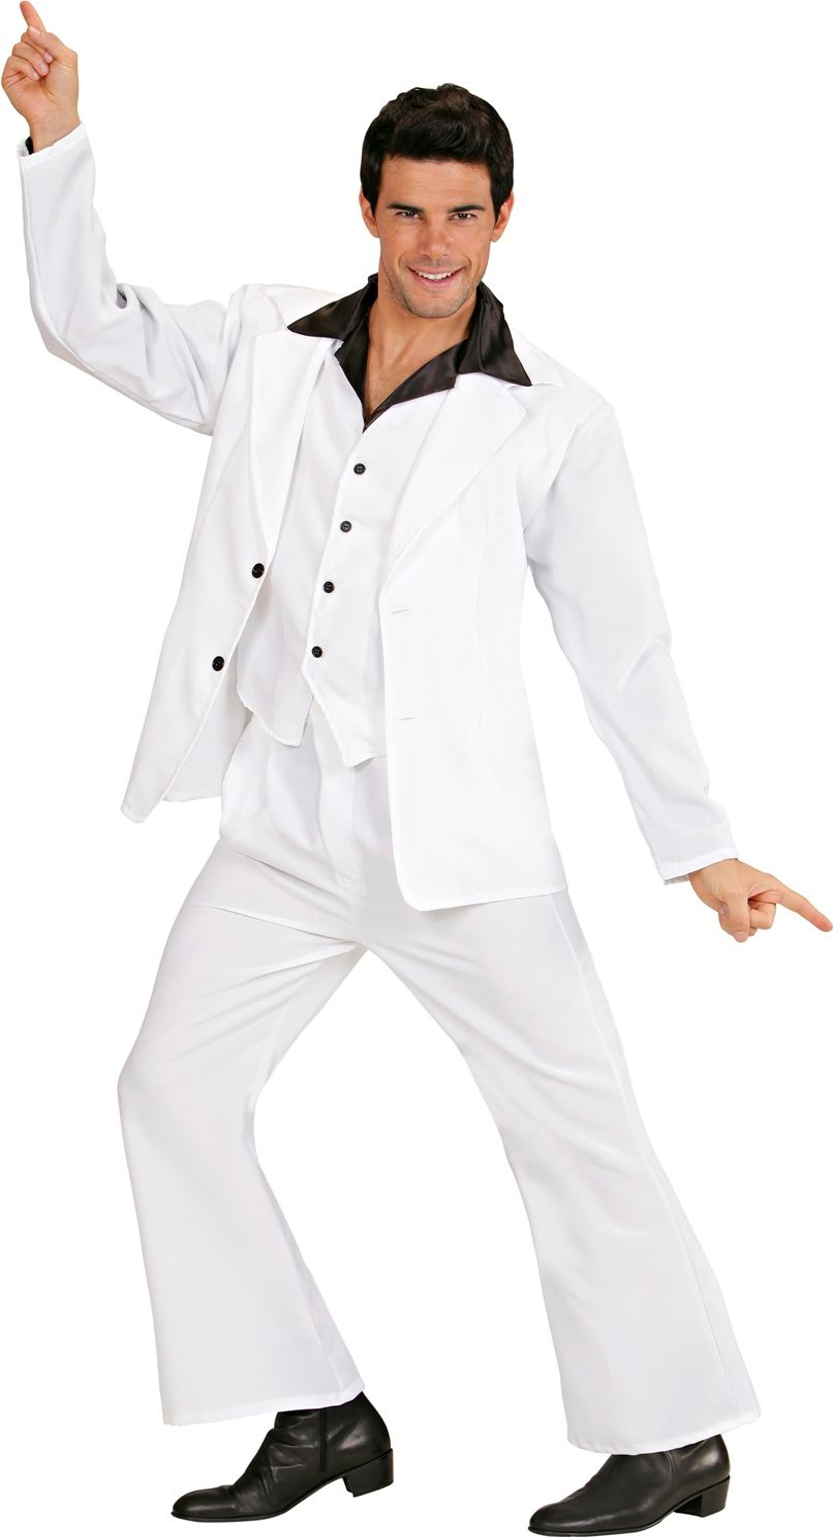 Disco fever 70s kostuum